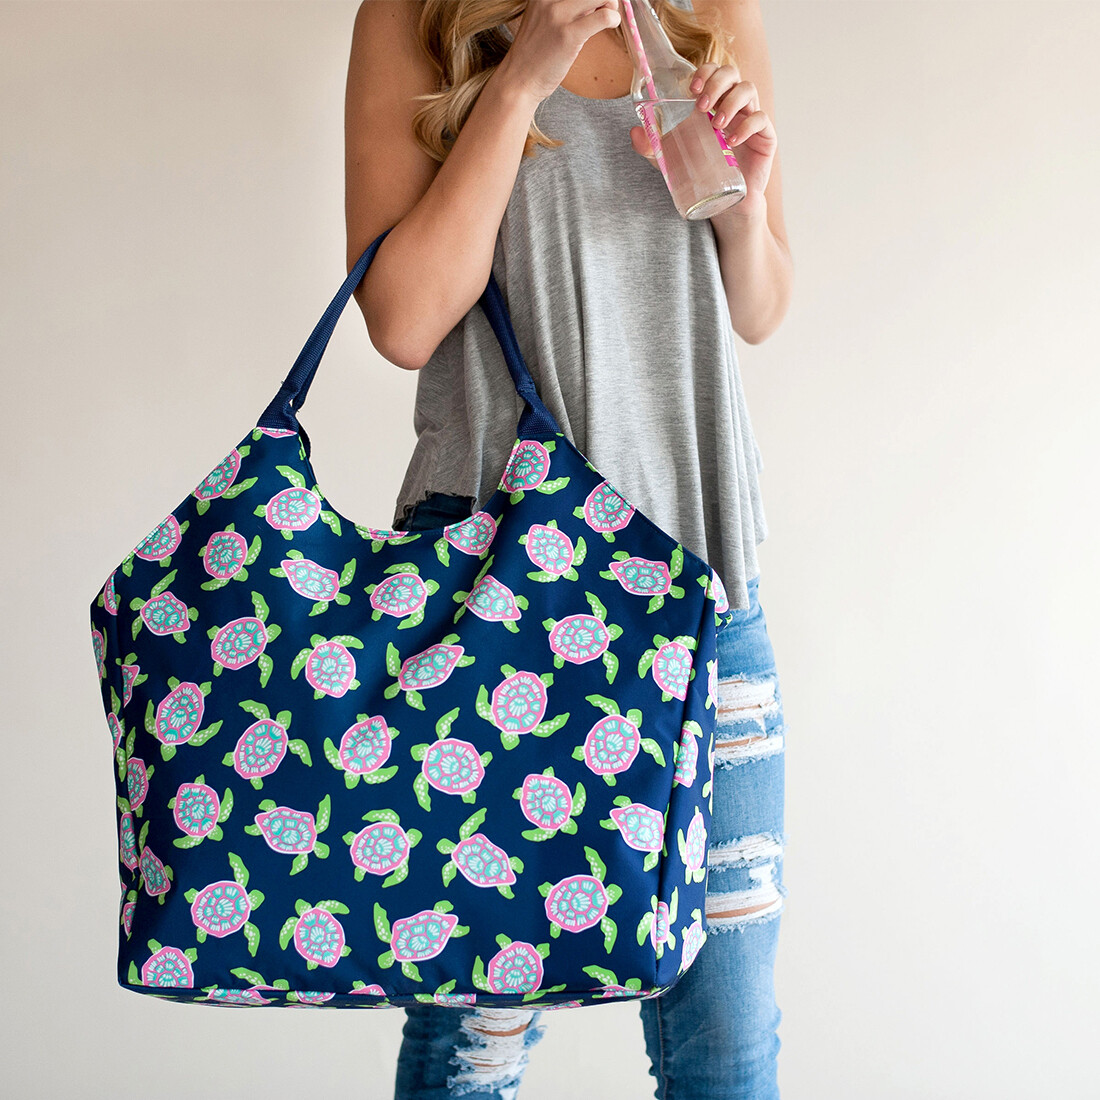 Turtle Bay Beach Bag